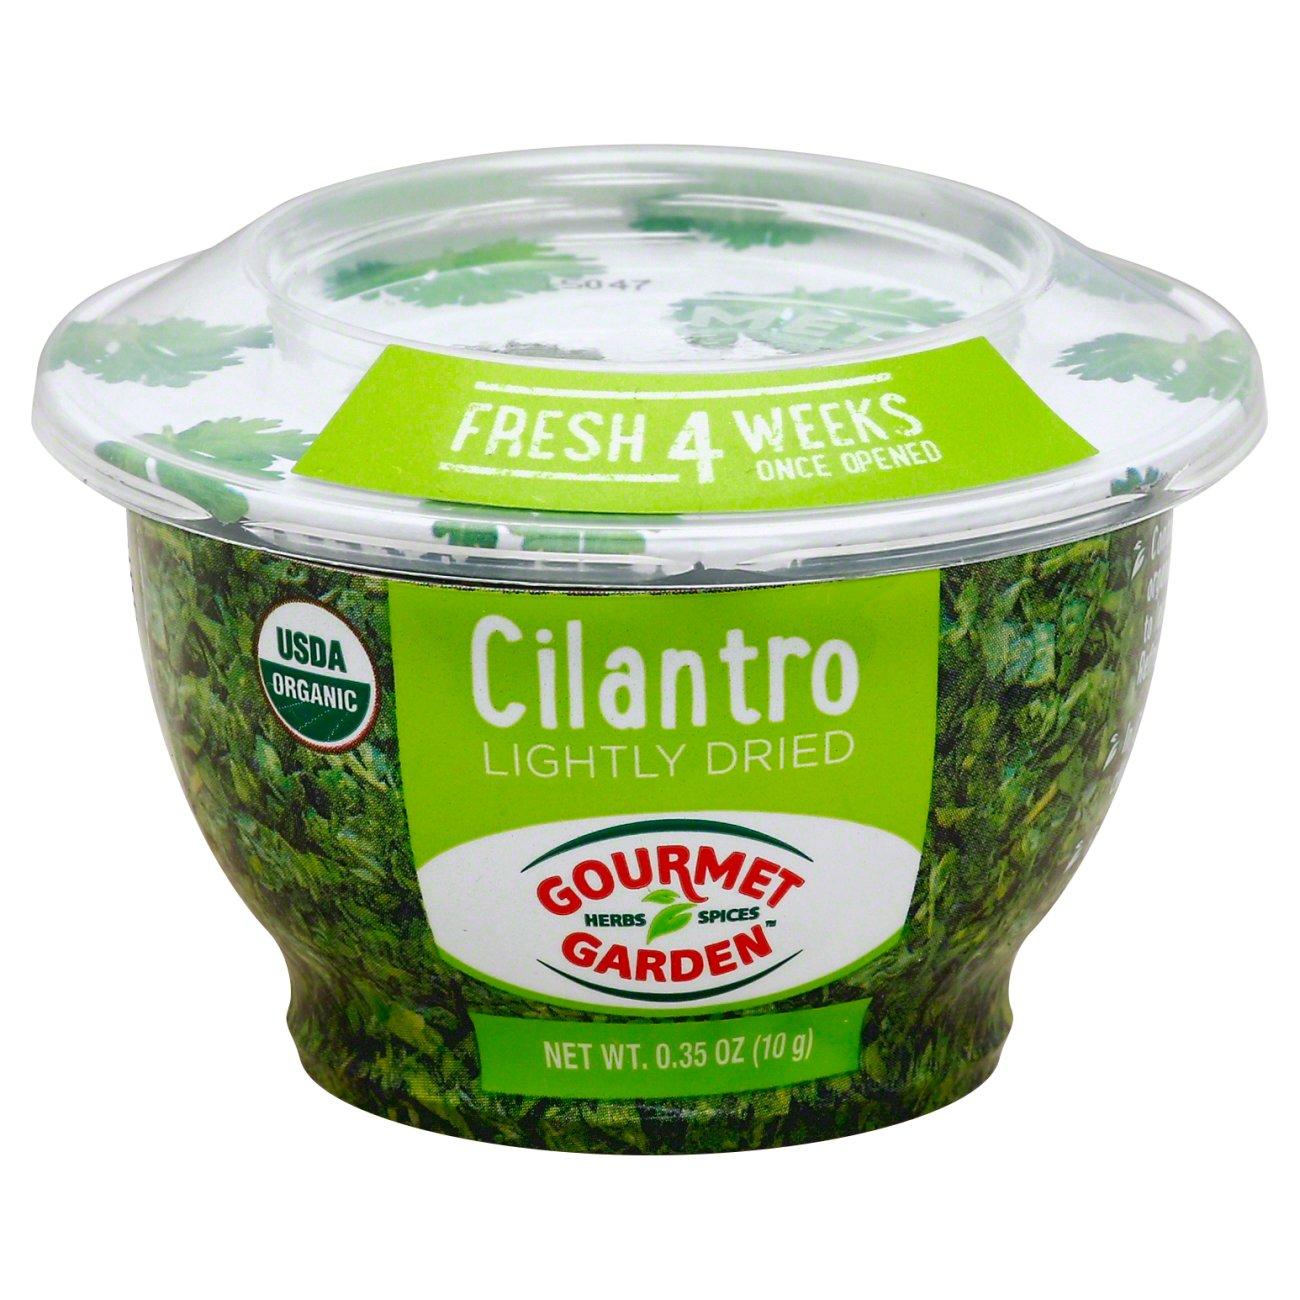 Useful product. Cilantro